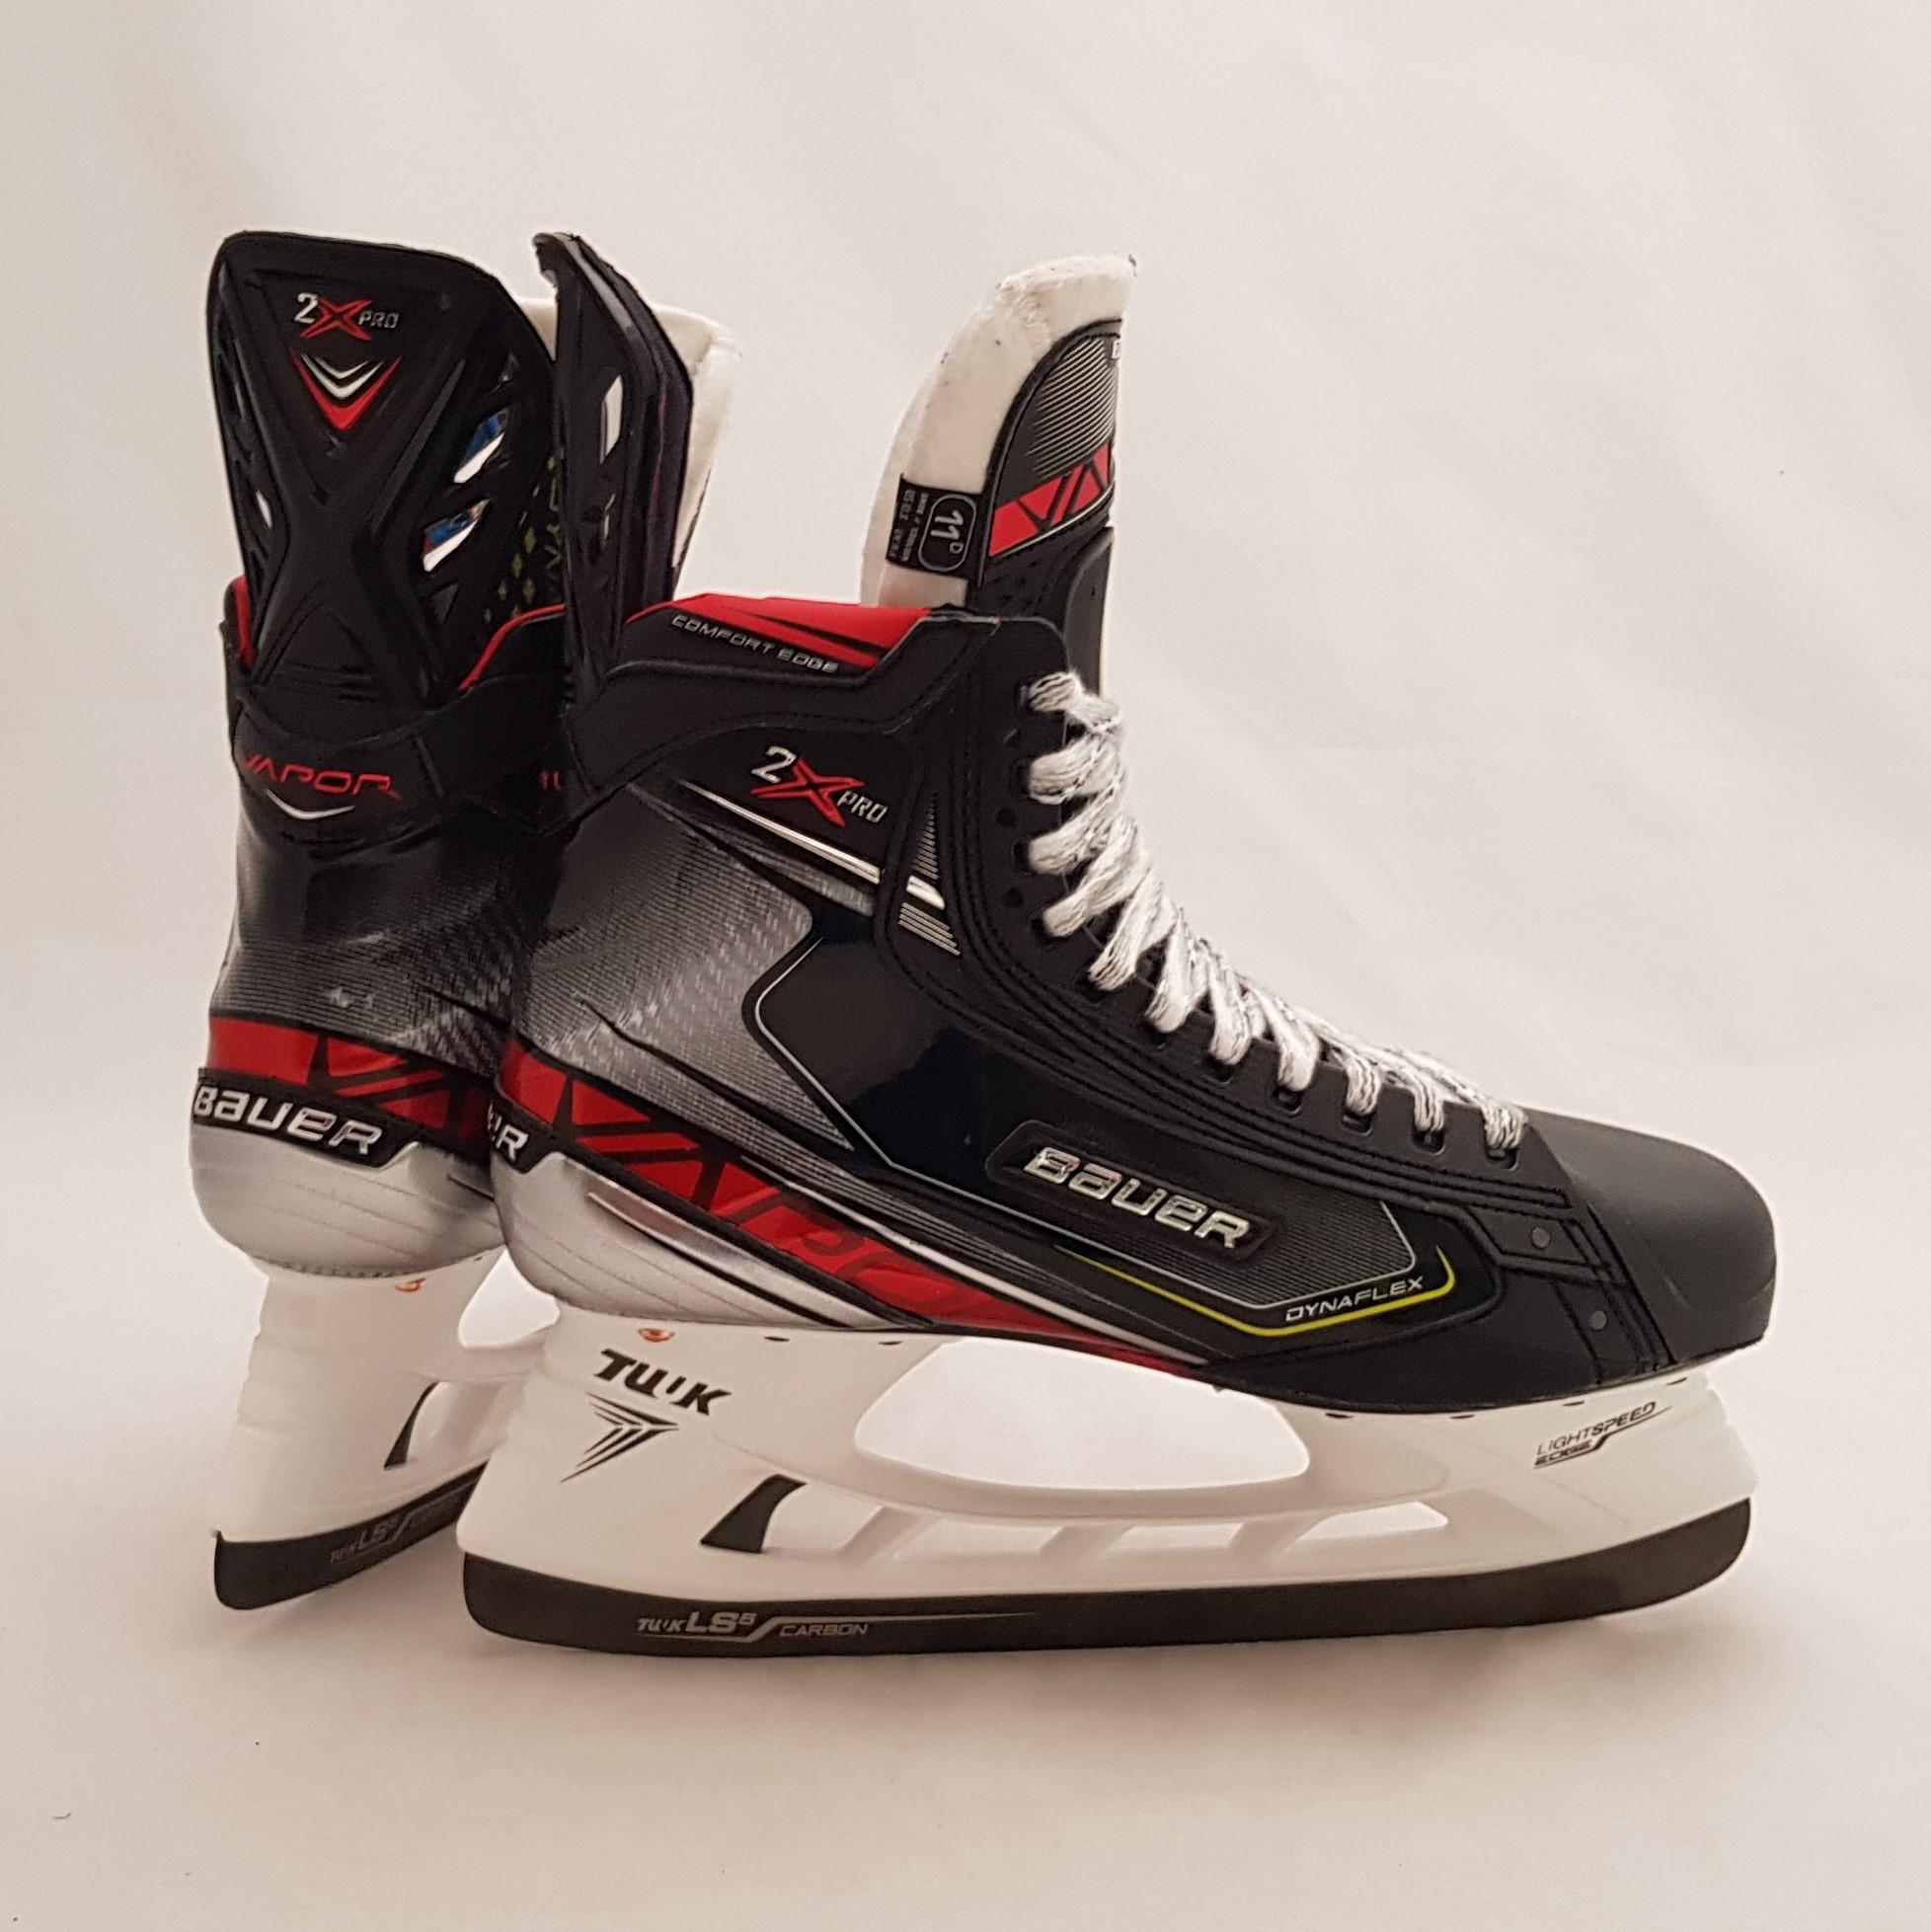 Demo BAUER Vapor 2X Pro S19 Senior Ice Hockey Skates